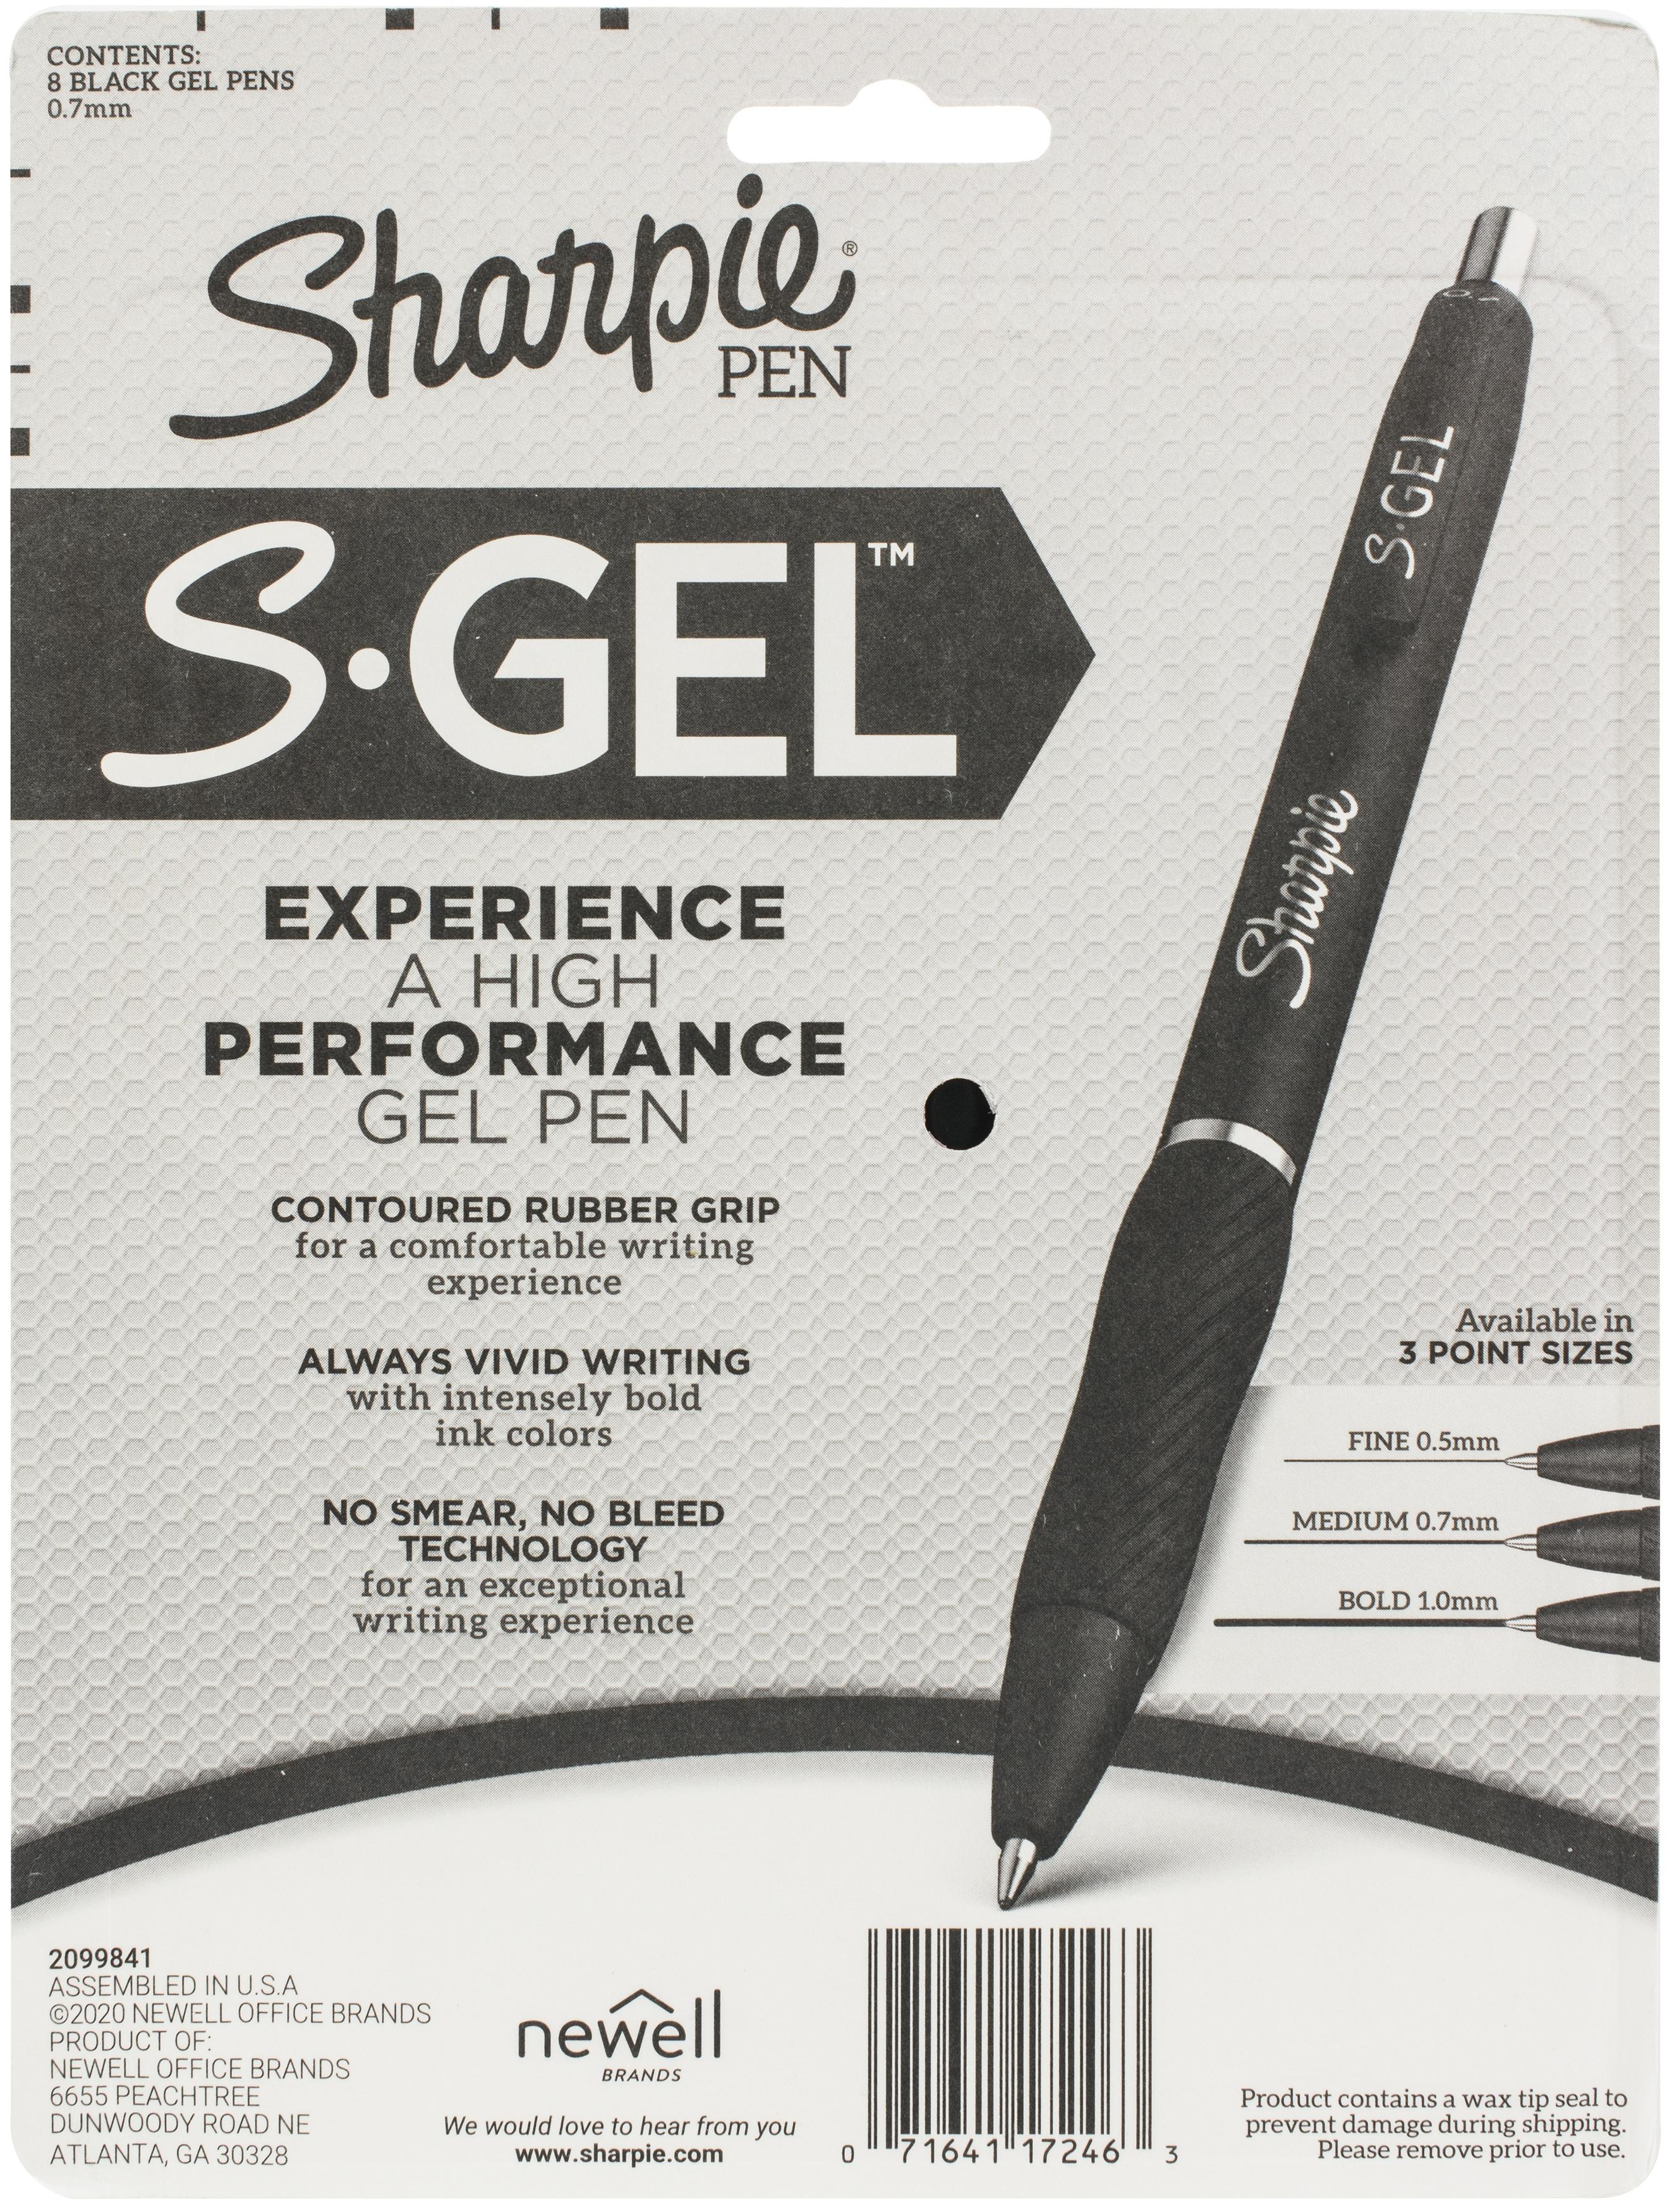 Sharpie S-Gel .7mm Medium Point Pen-Black